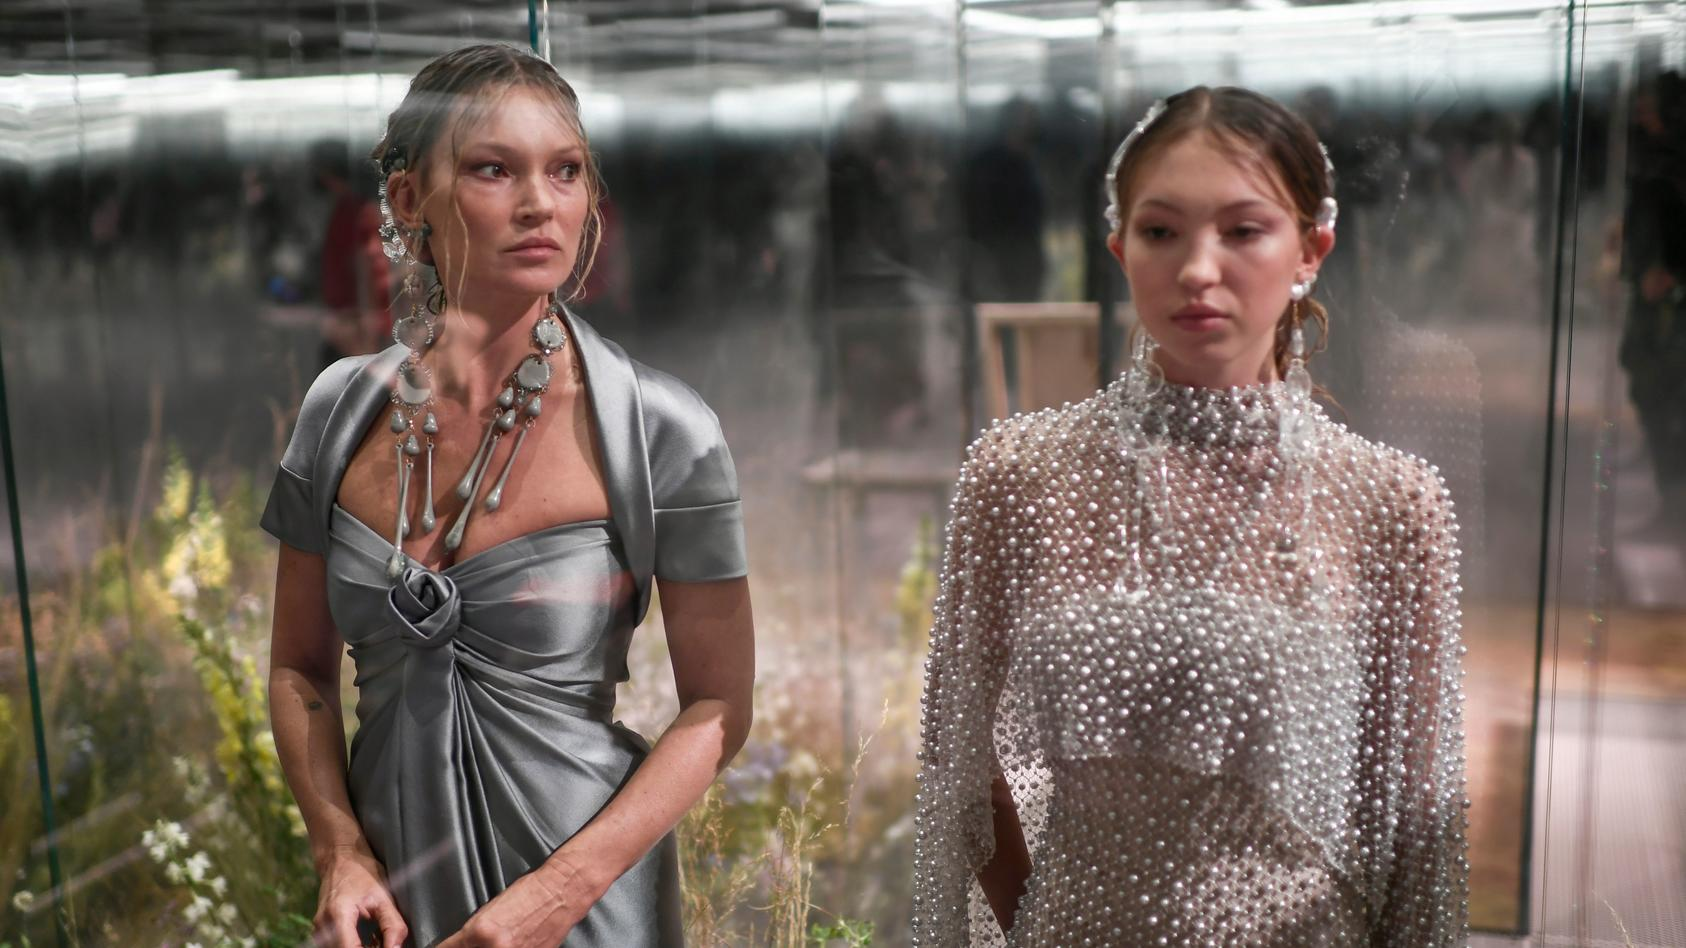 Kate Moss und Lila Moss bei der Pariser Fashion Week.